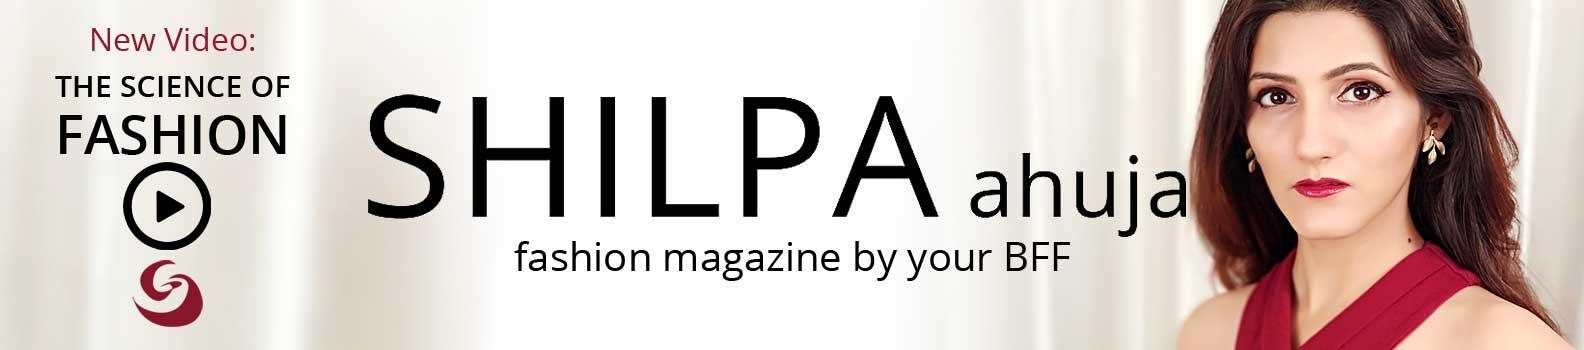 18-08-11-shilpa-ahuja-fashion-magazine-style-trends-news-latest